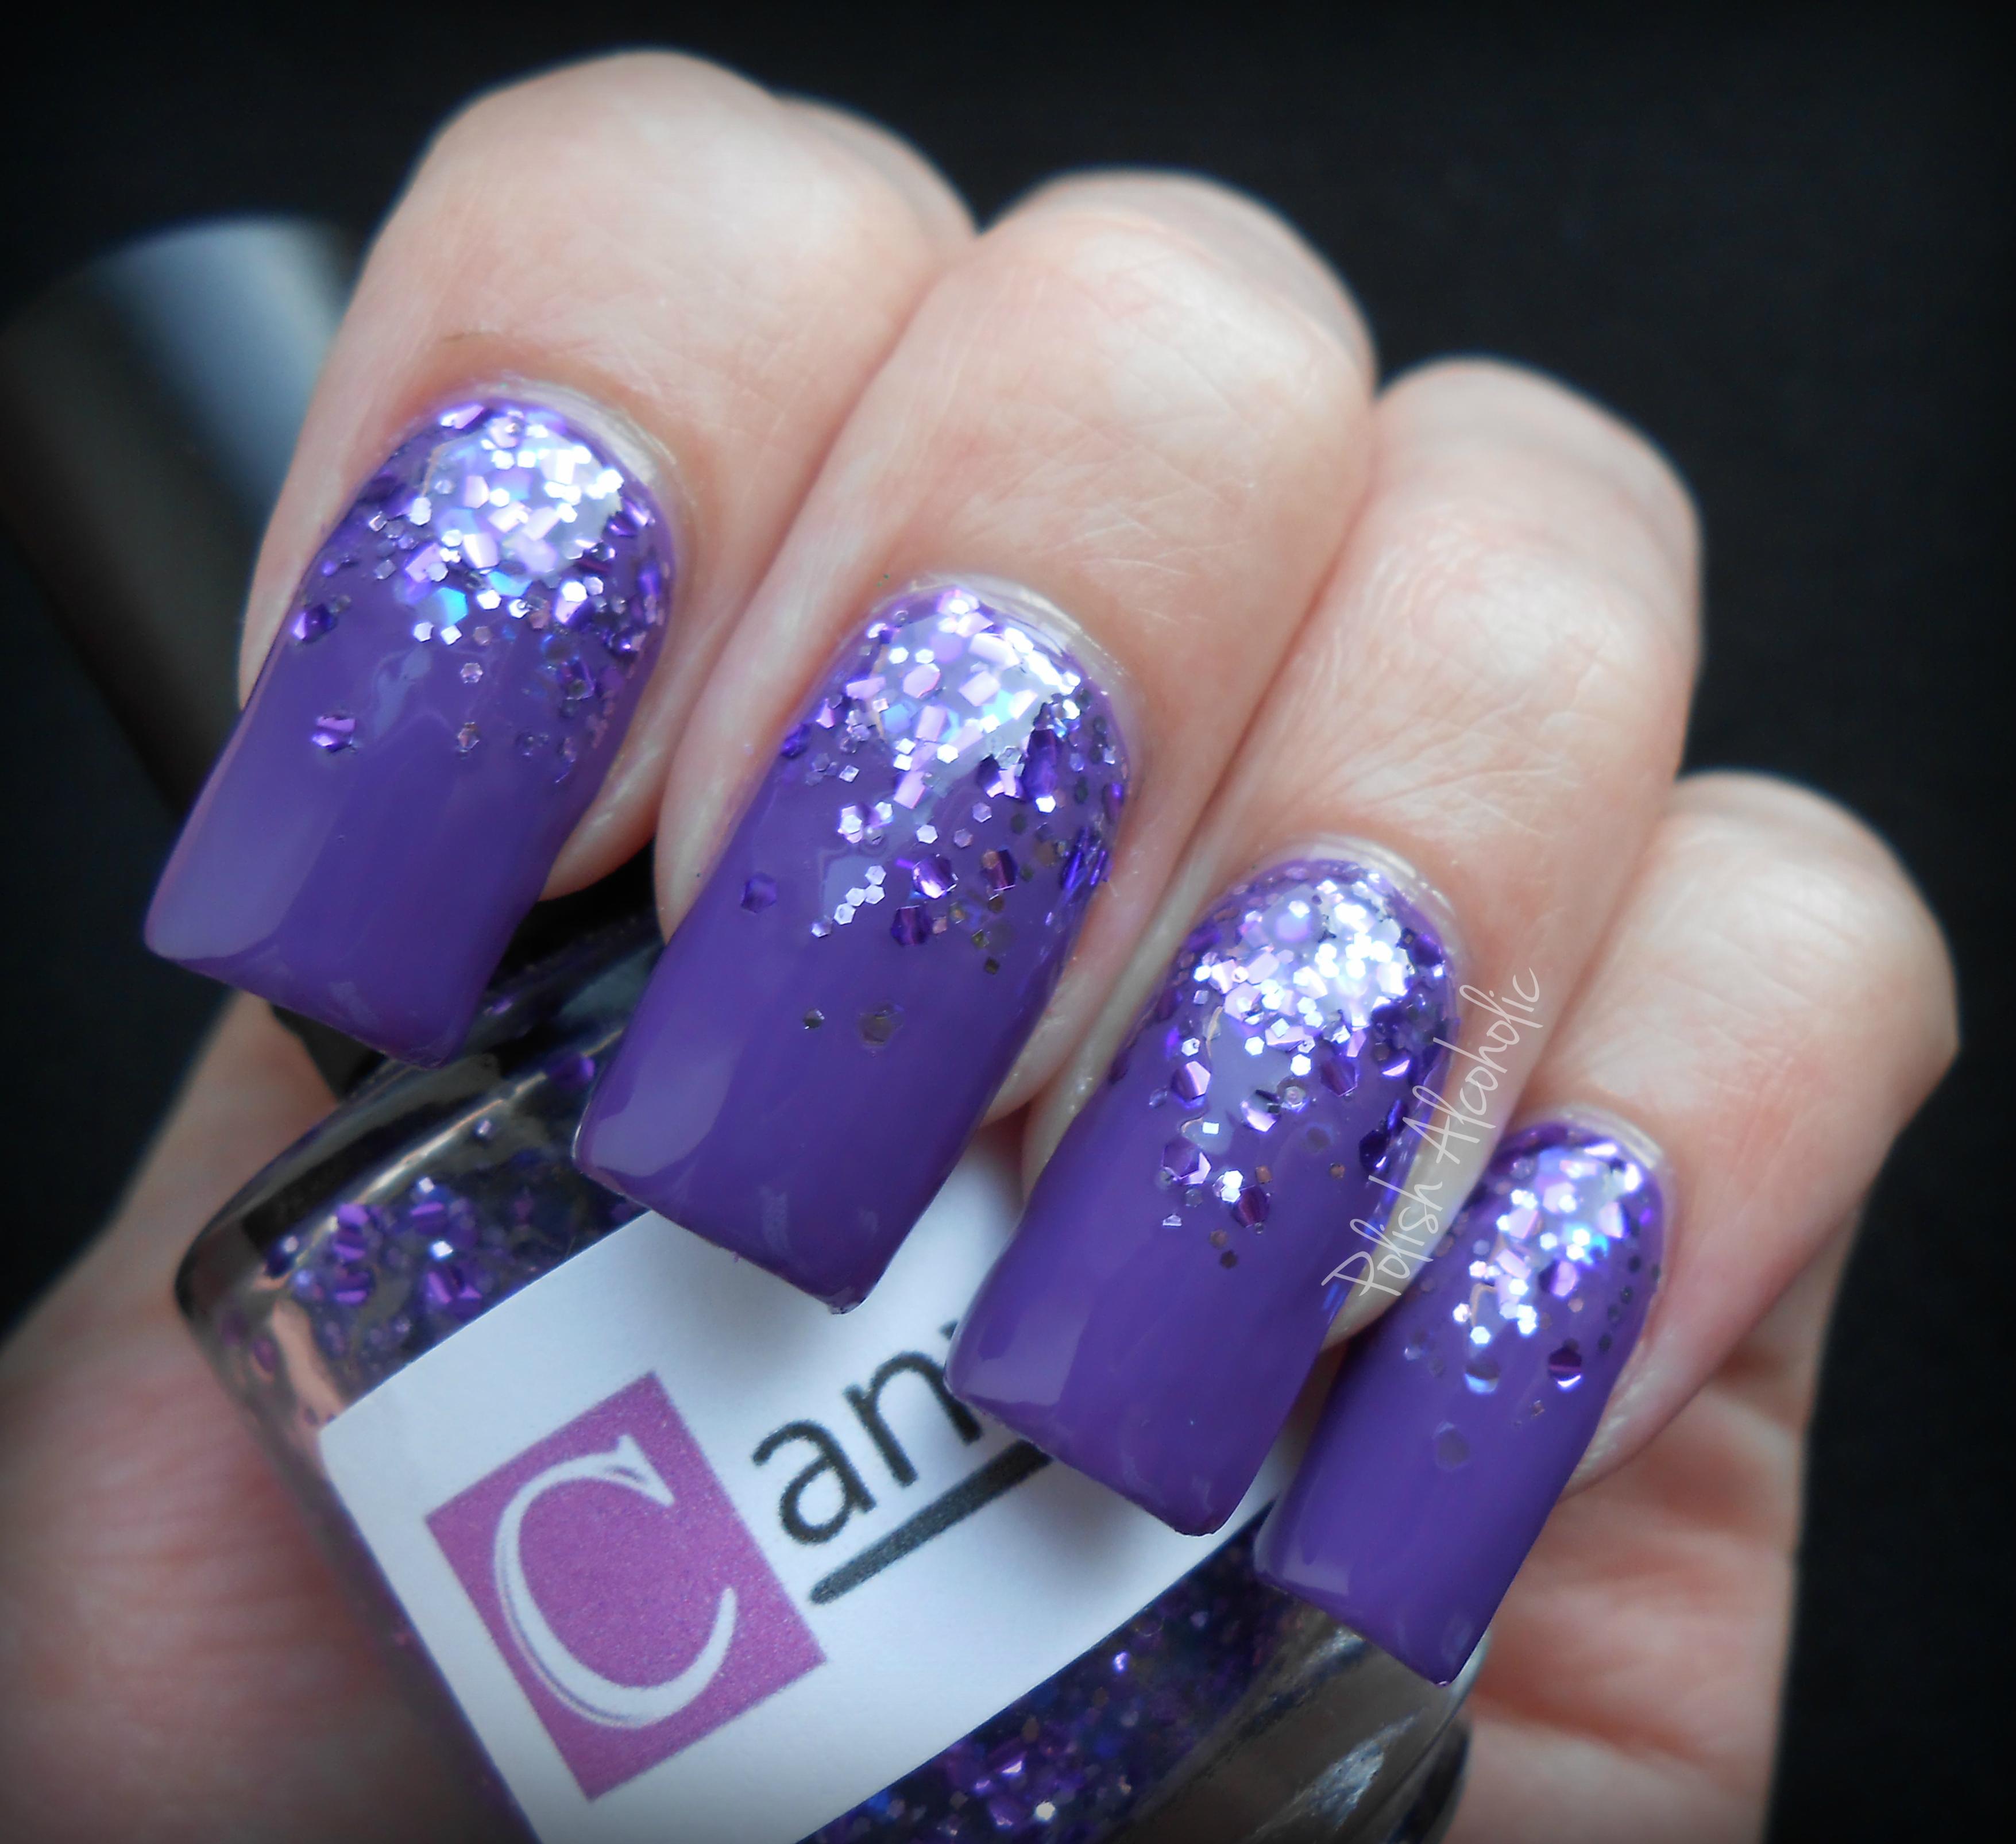 canvas nails bold and bright purple | polish alcoholic